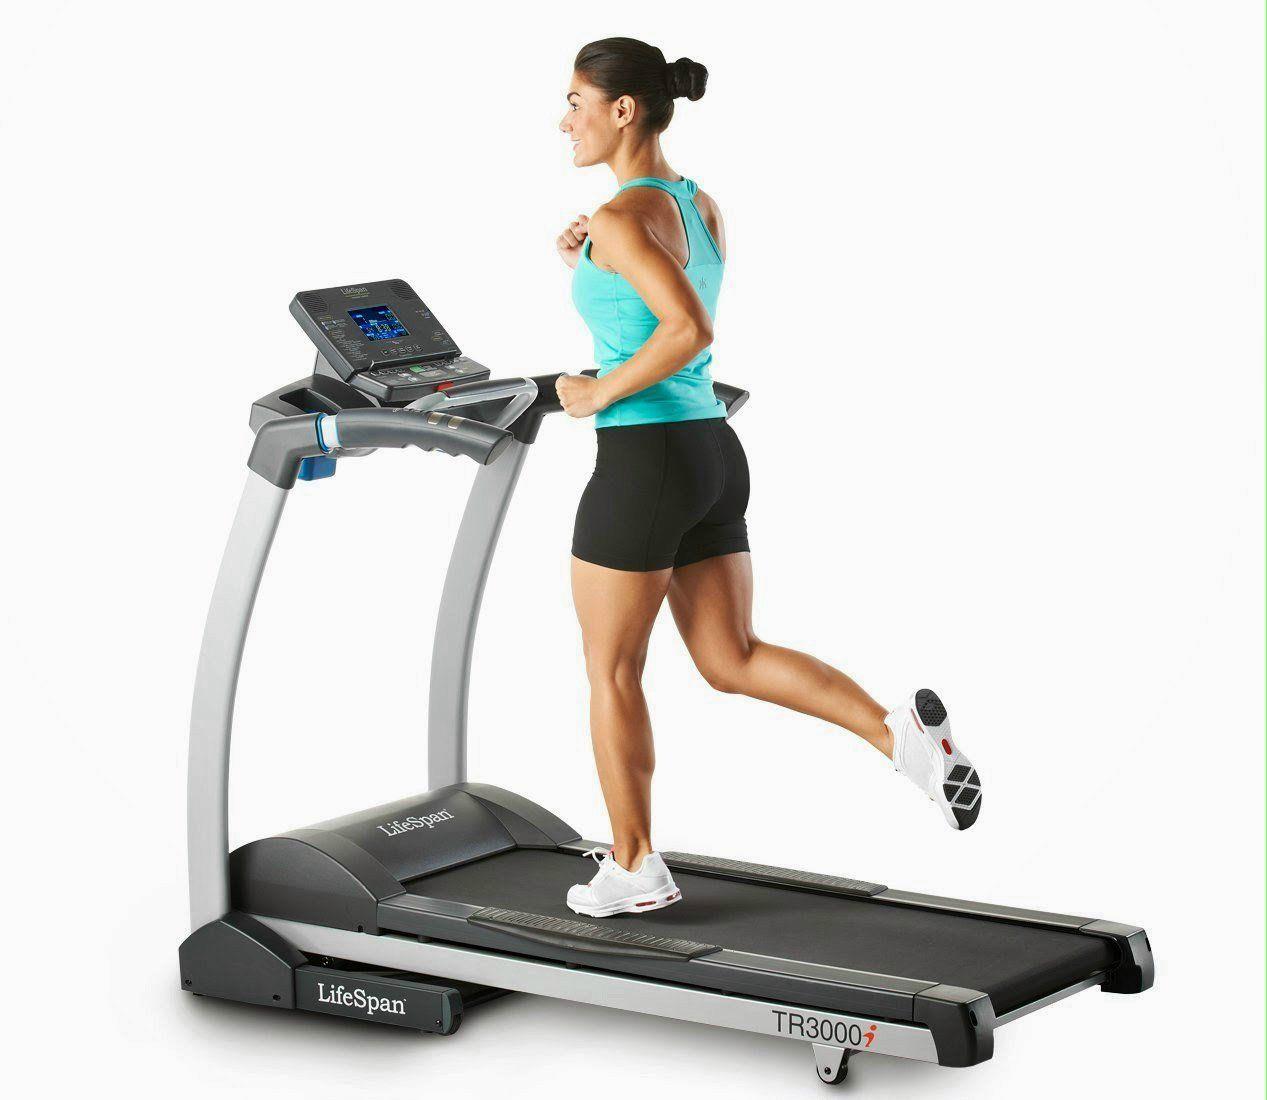 lifespantr3000ifoldingtreadmill-fitness